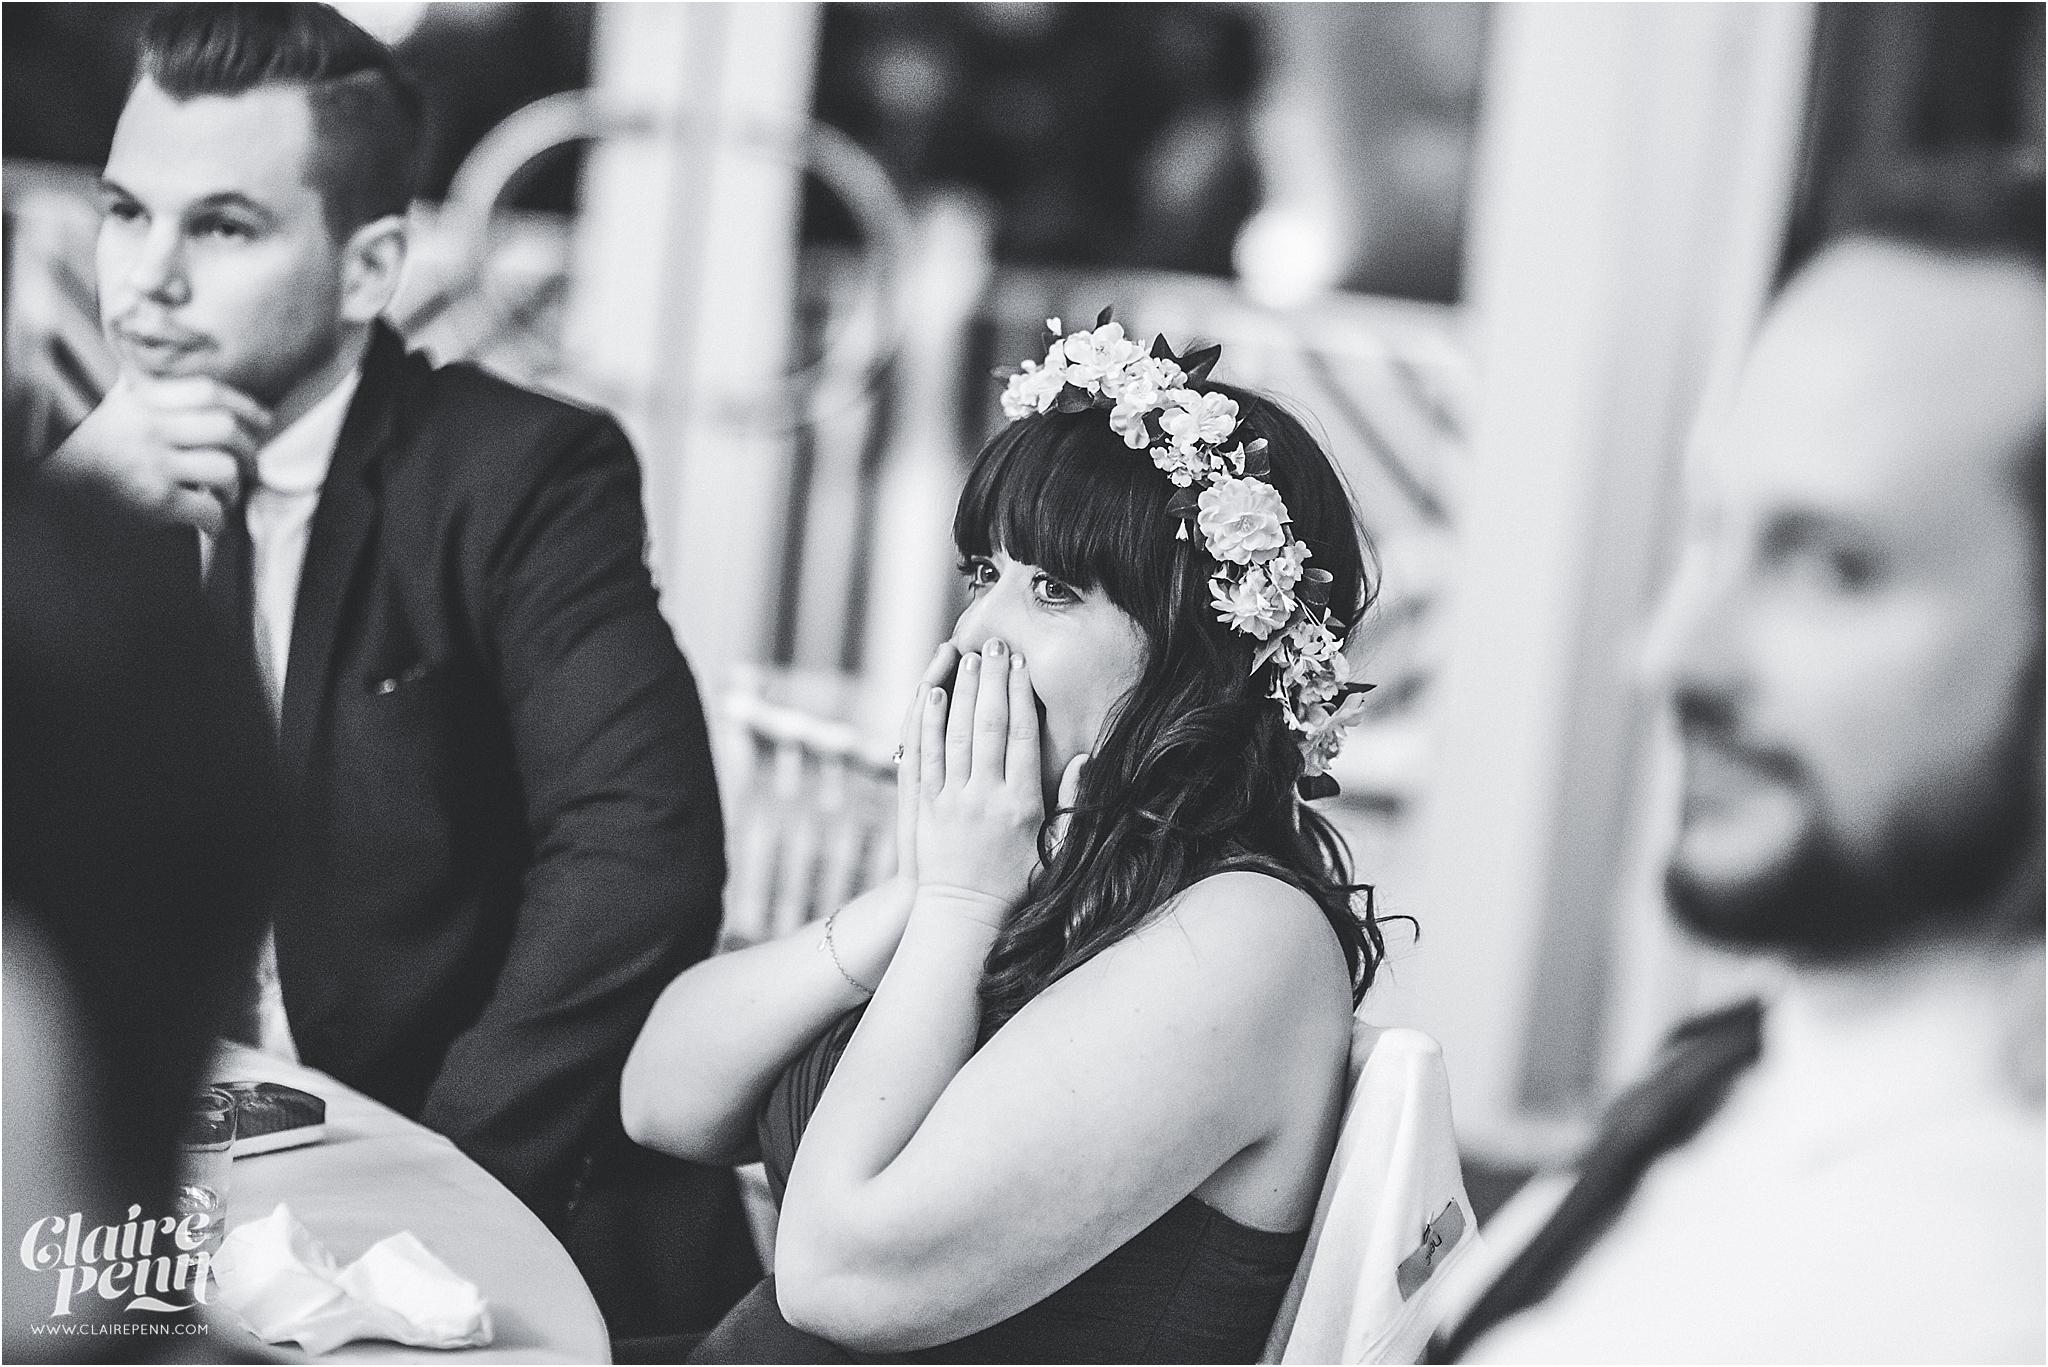 Iscoyd Park wedding, Whitchurch, Cheshire wedding photographer_0057.jpg